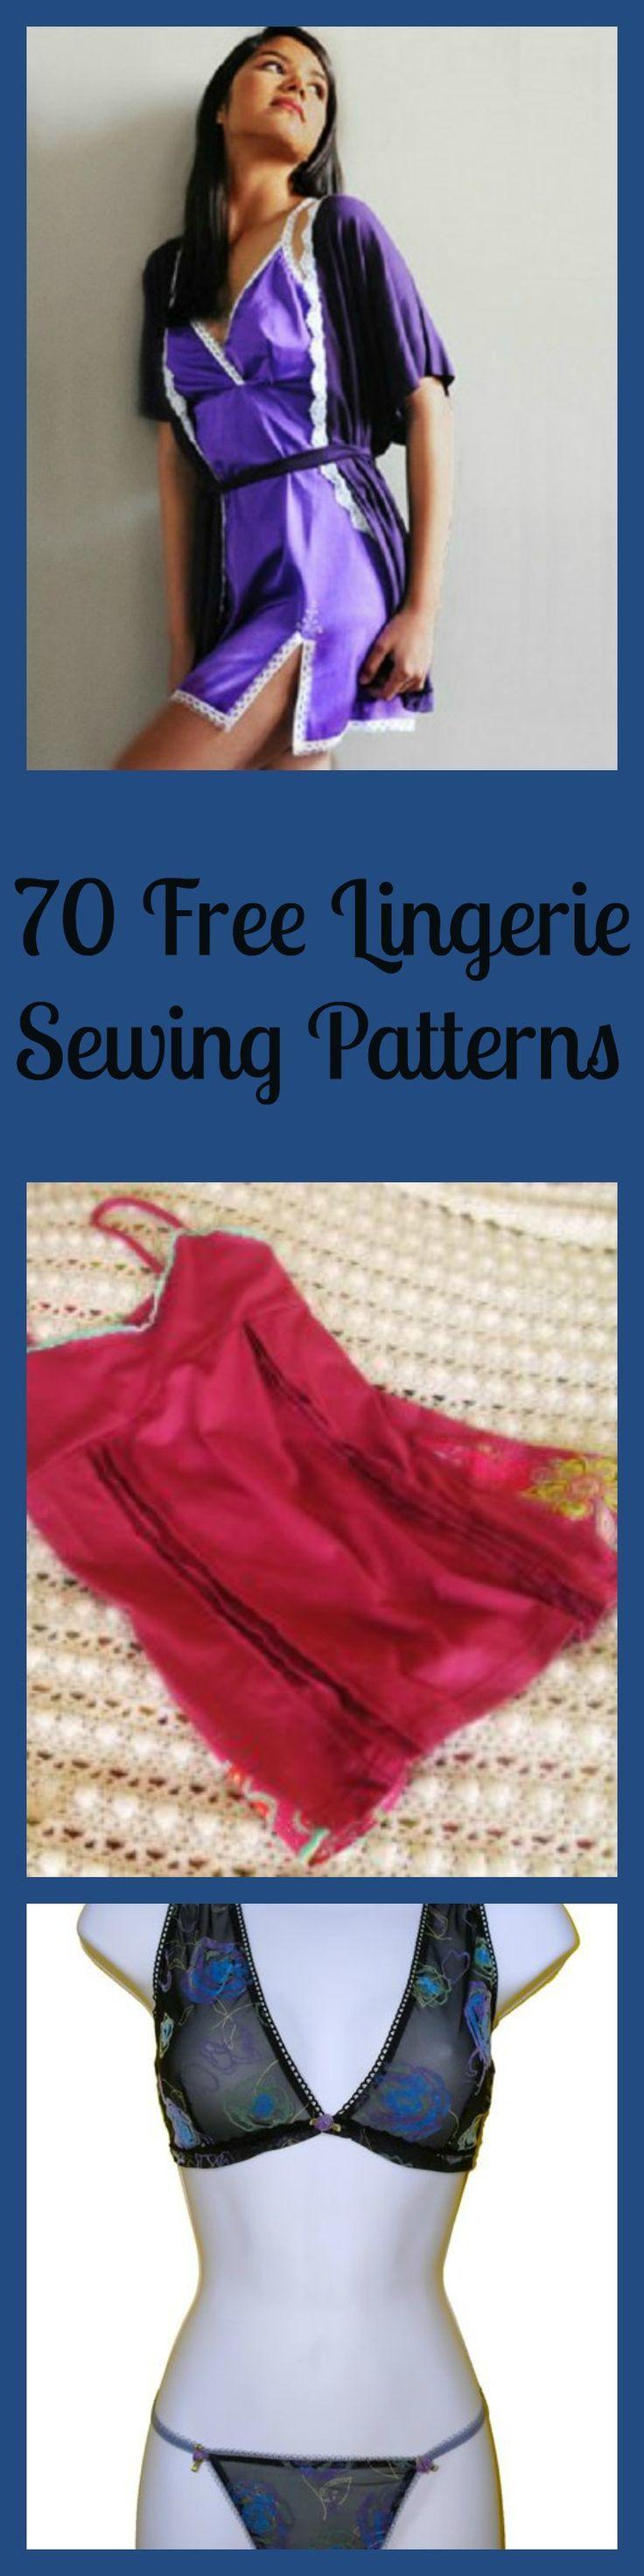 70 Free Lingerie Sewing Patterns - lingerie slip, hottest womens lingerie, women's intimates *sponsored